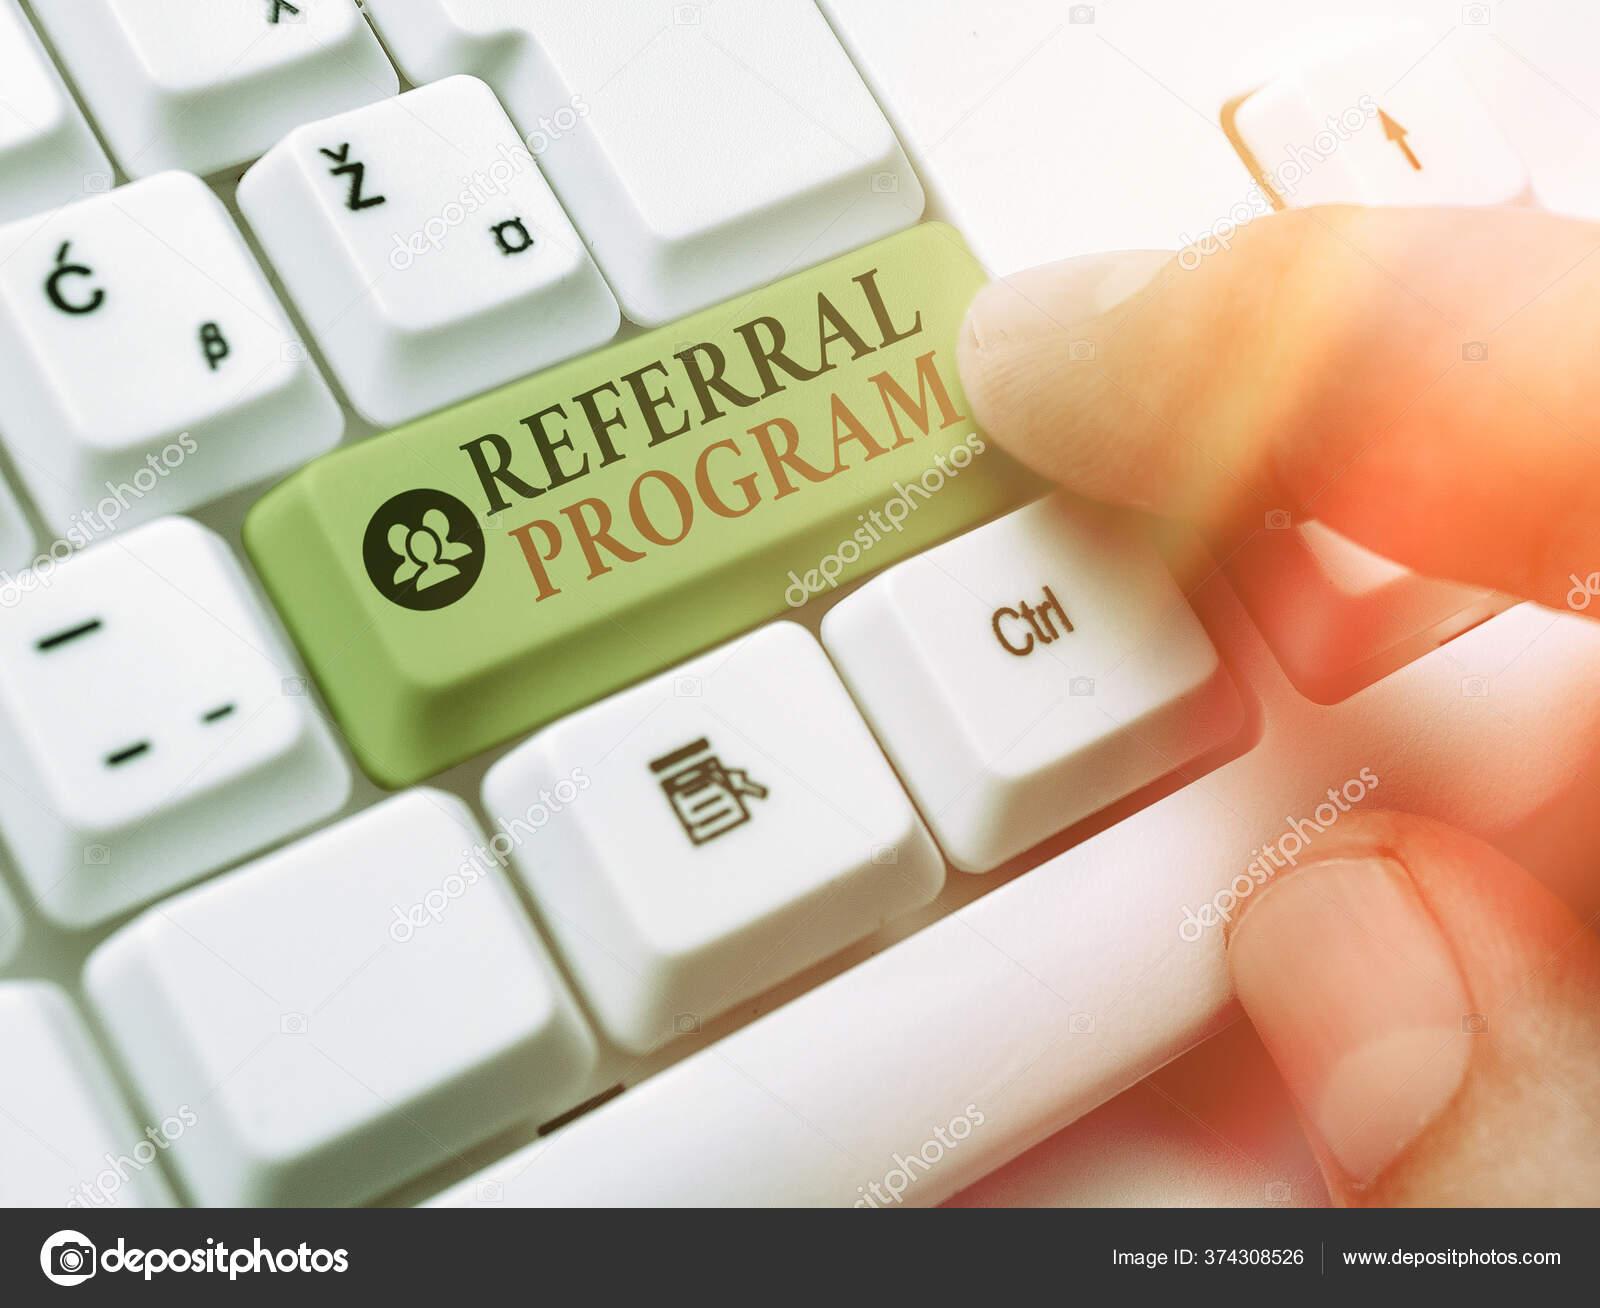 https tr depositphotos com 374308526 stock photo handwriting text writing referral program html